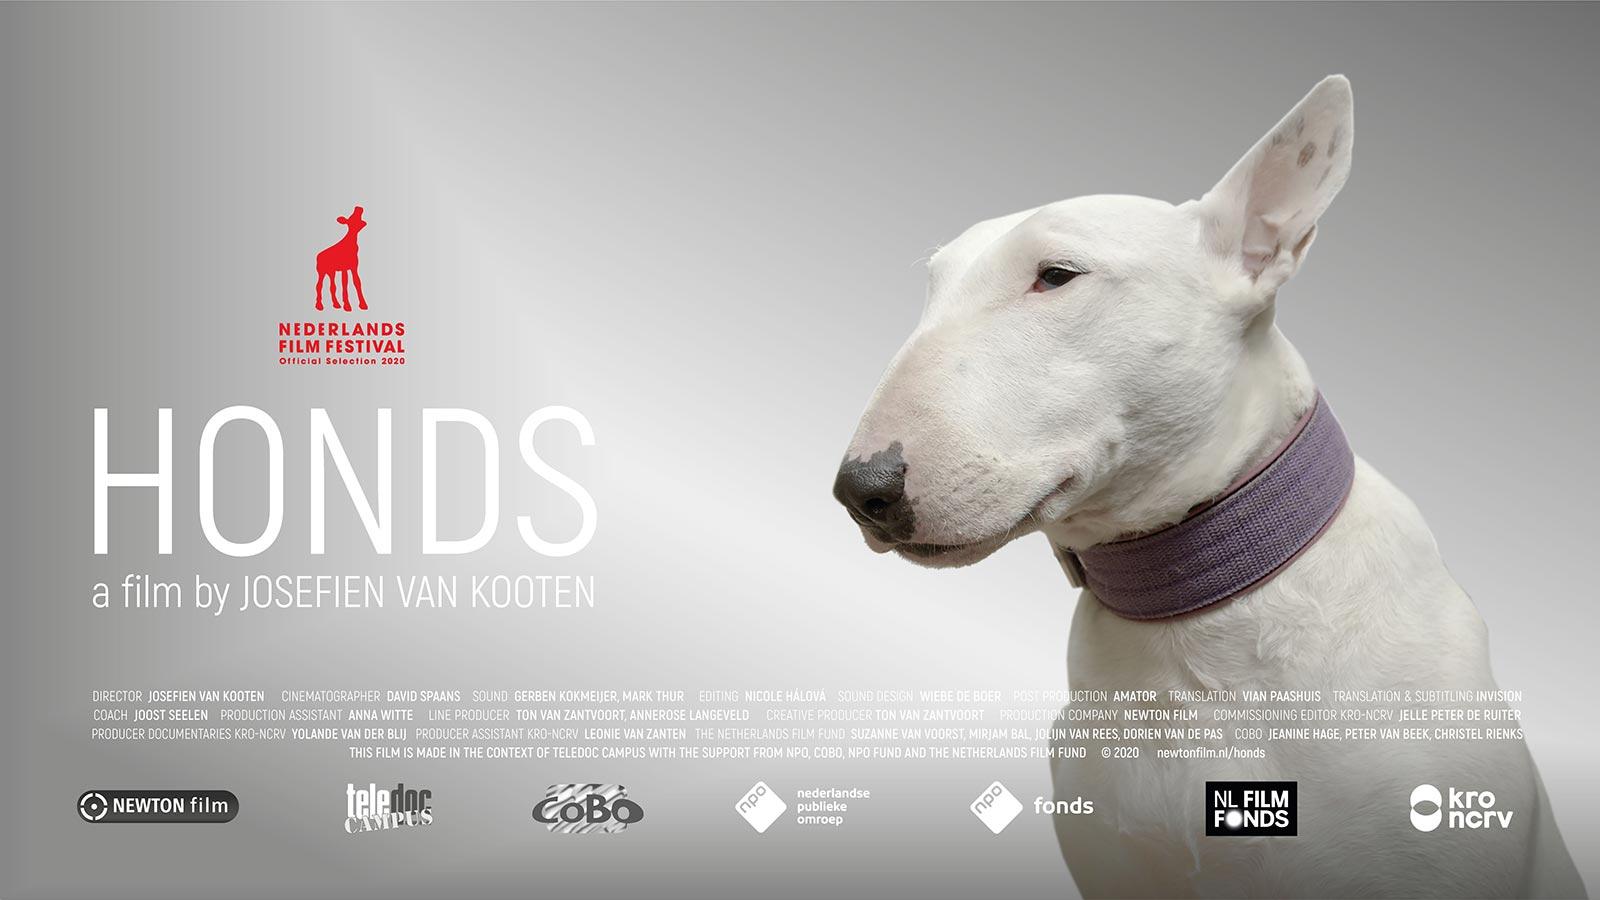 HONDS_a-NEWTONfilm-by-Josefien-van-Kooten